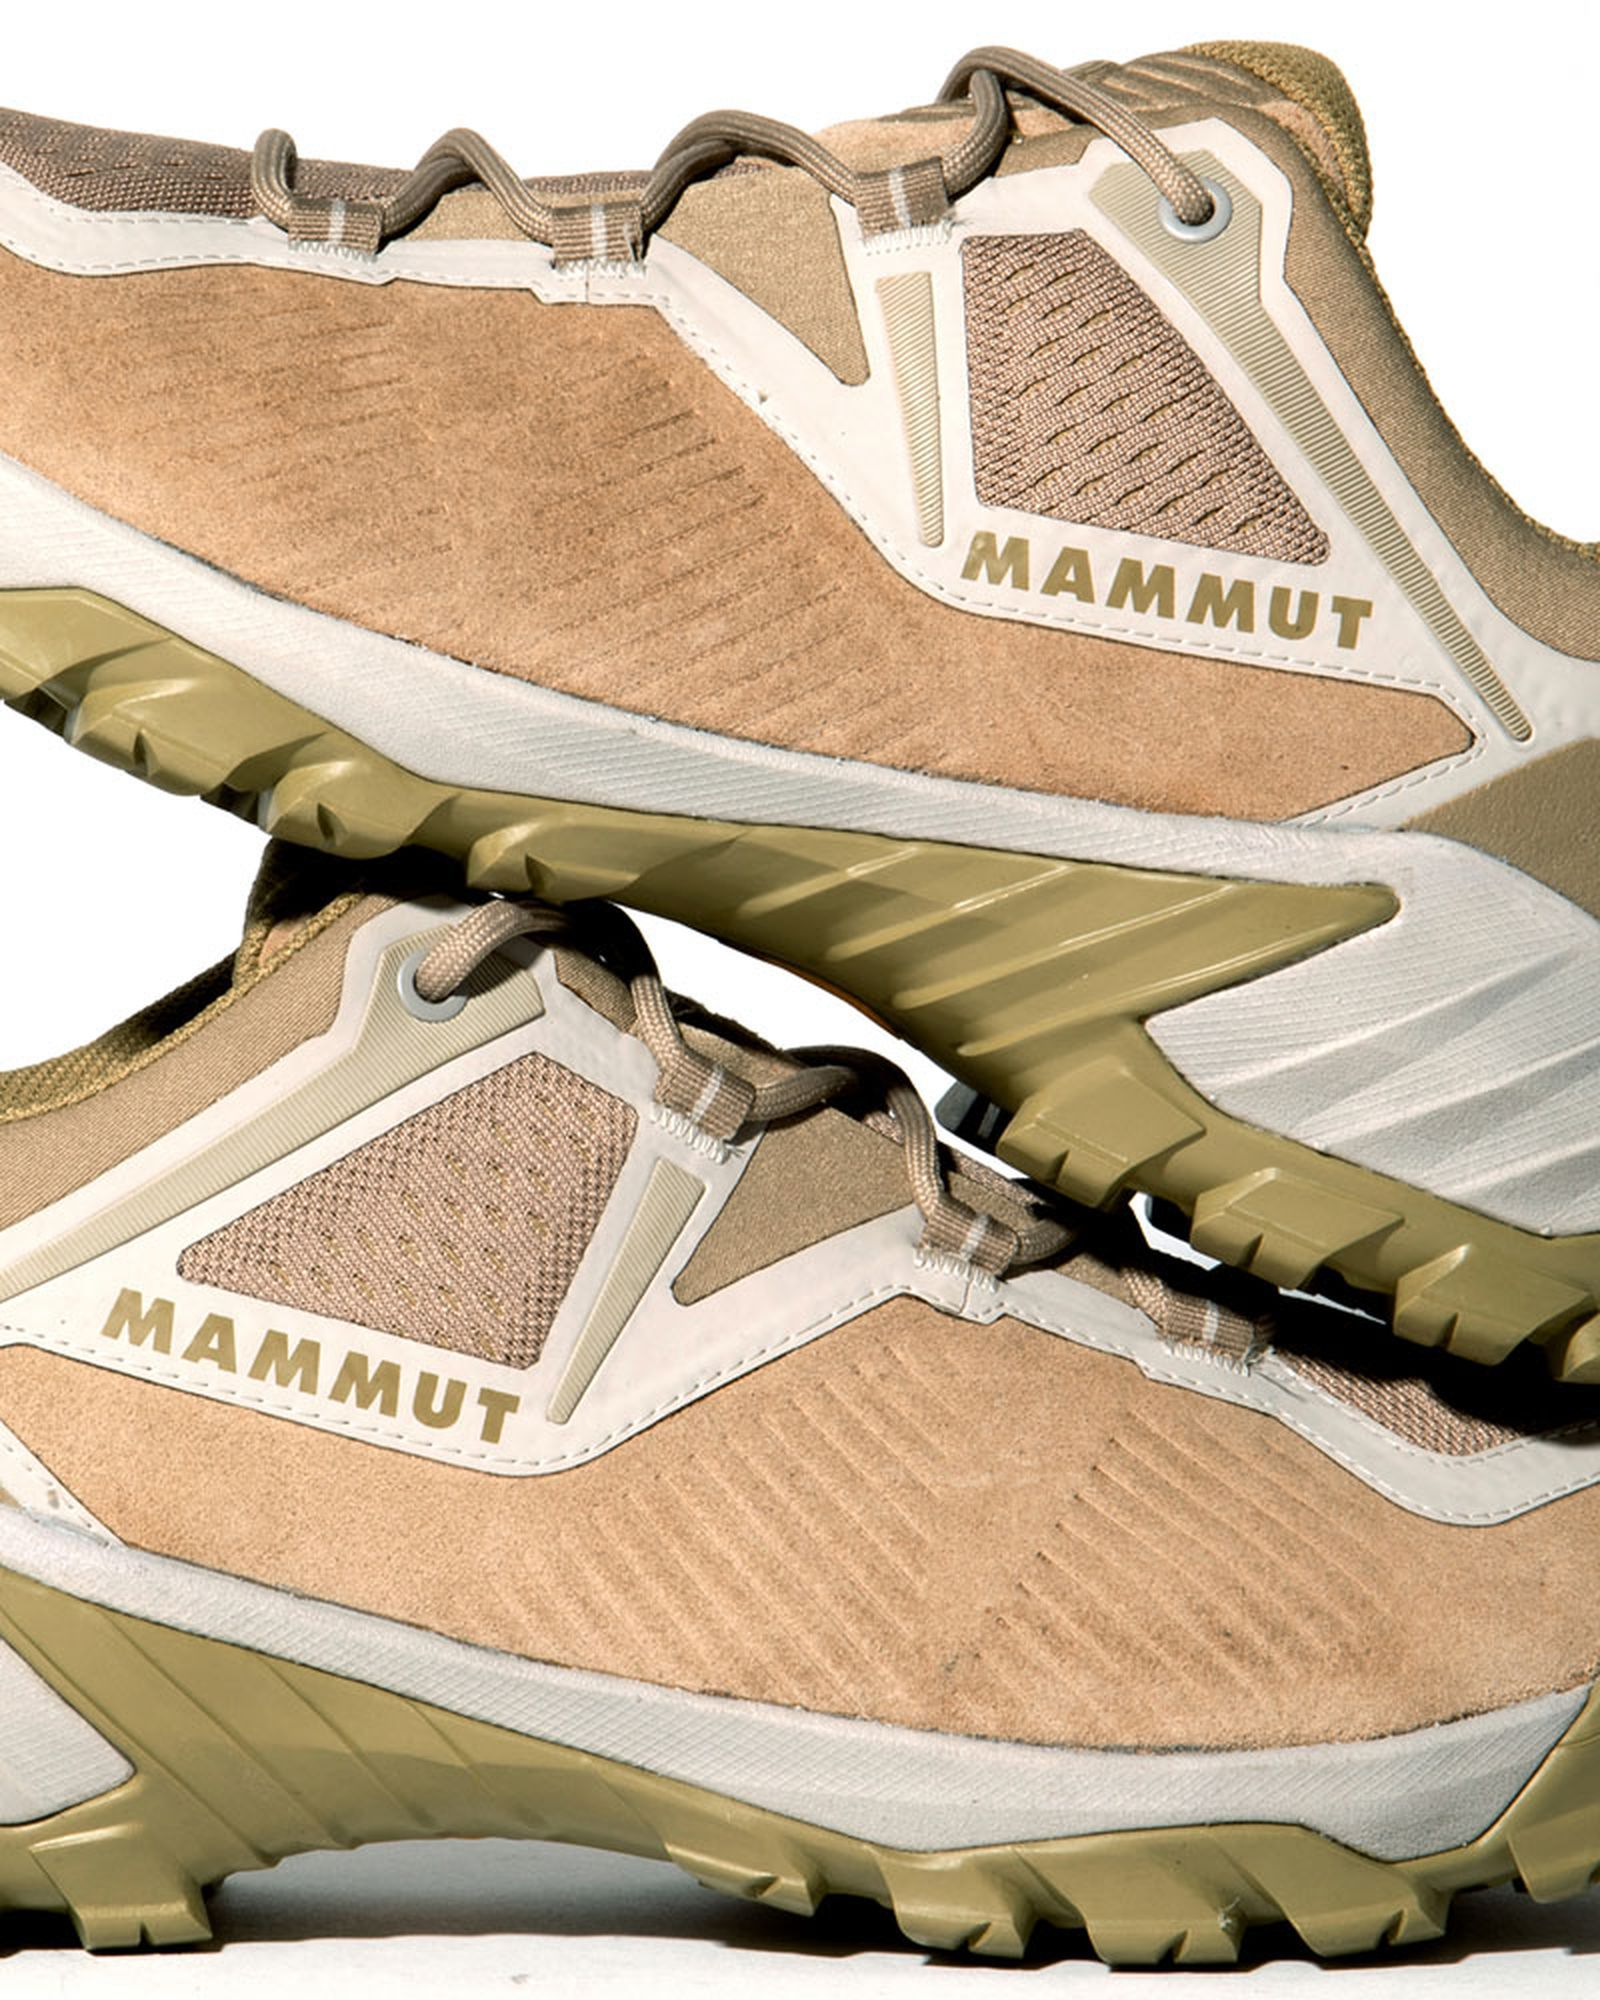 hobo-x-mammut-sapuen-low-gtx-release-info-date-price-04